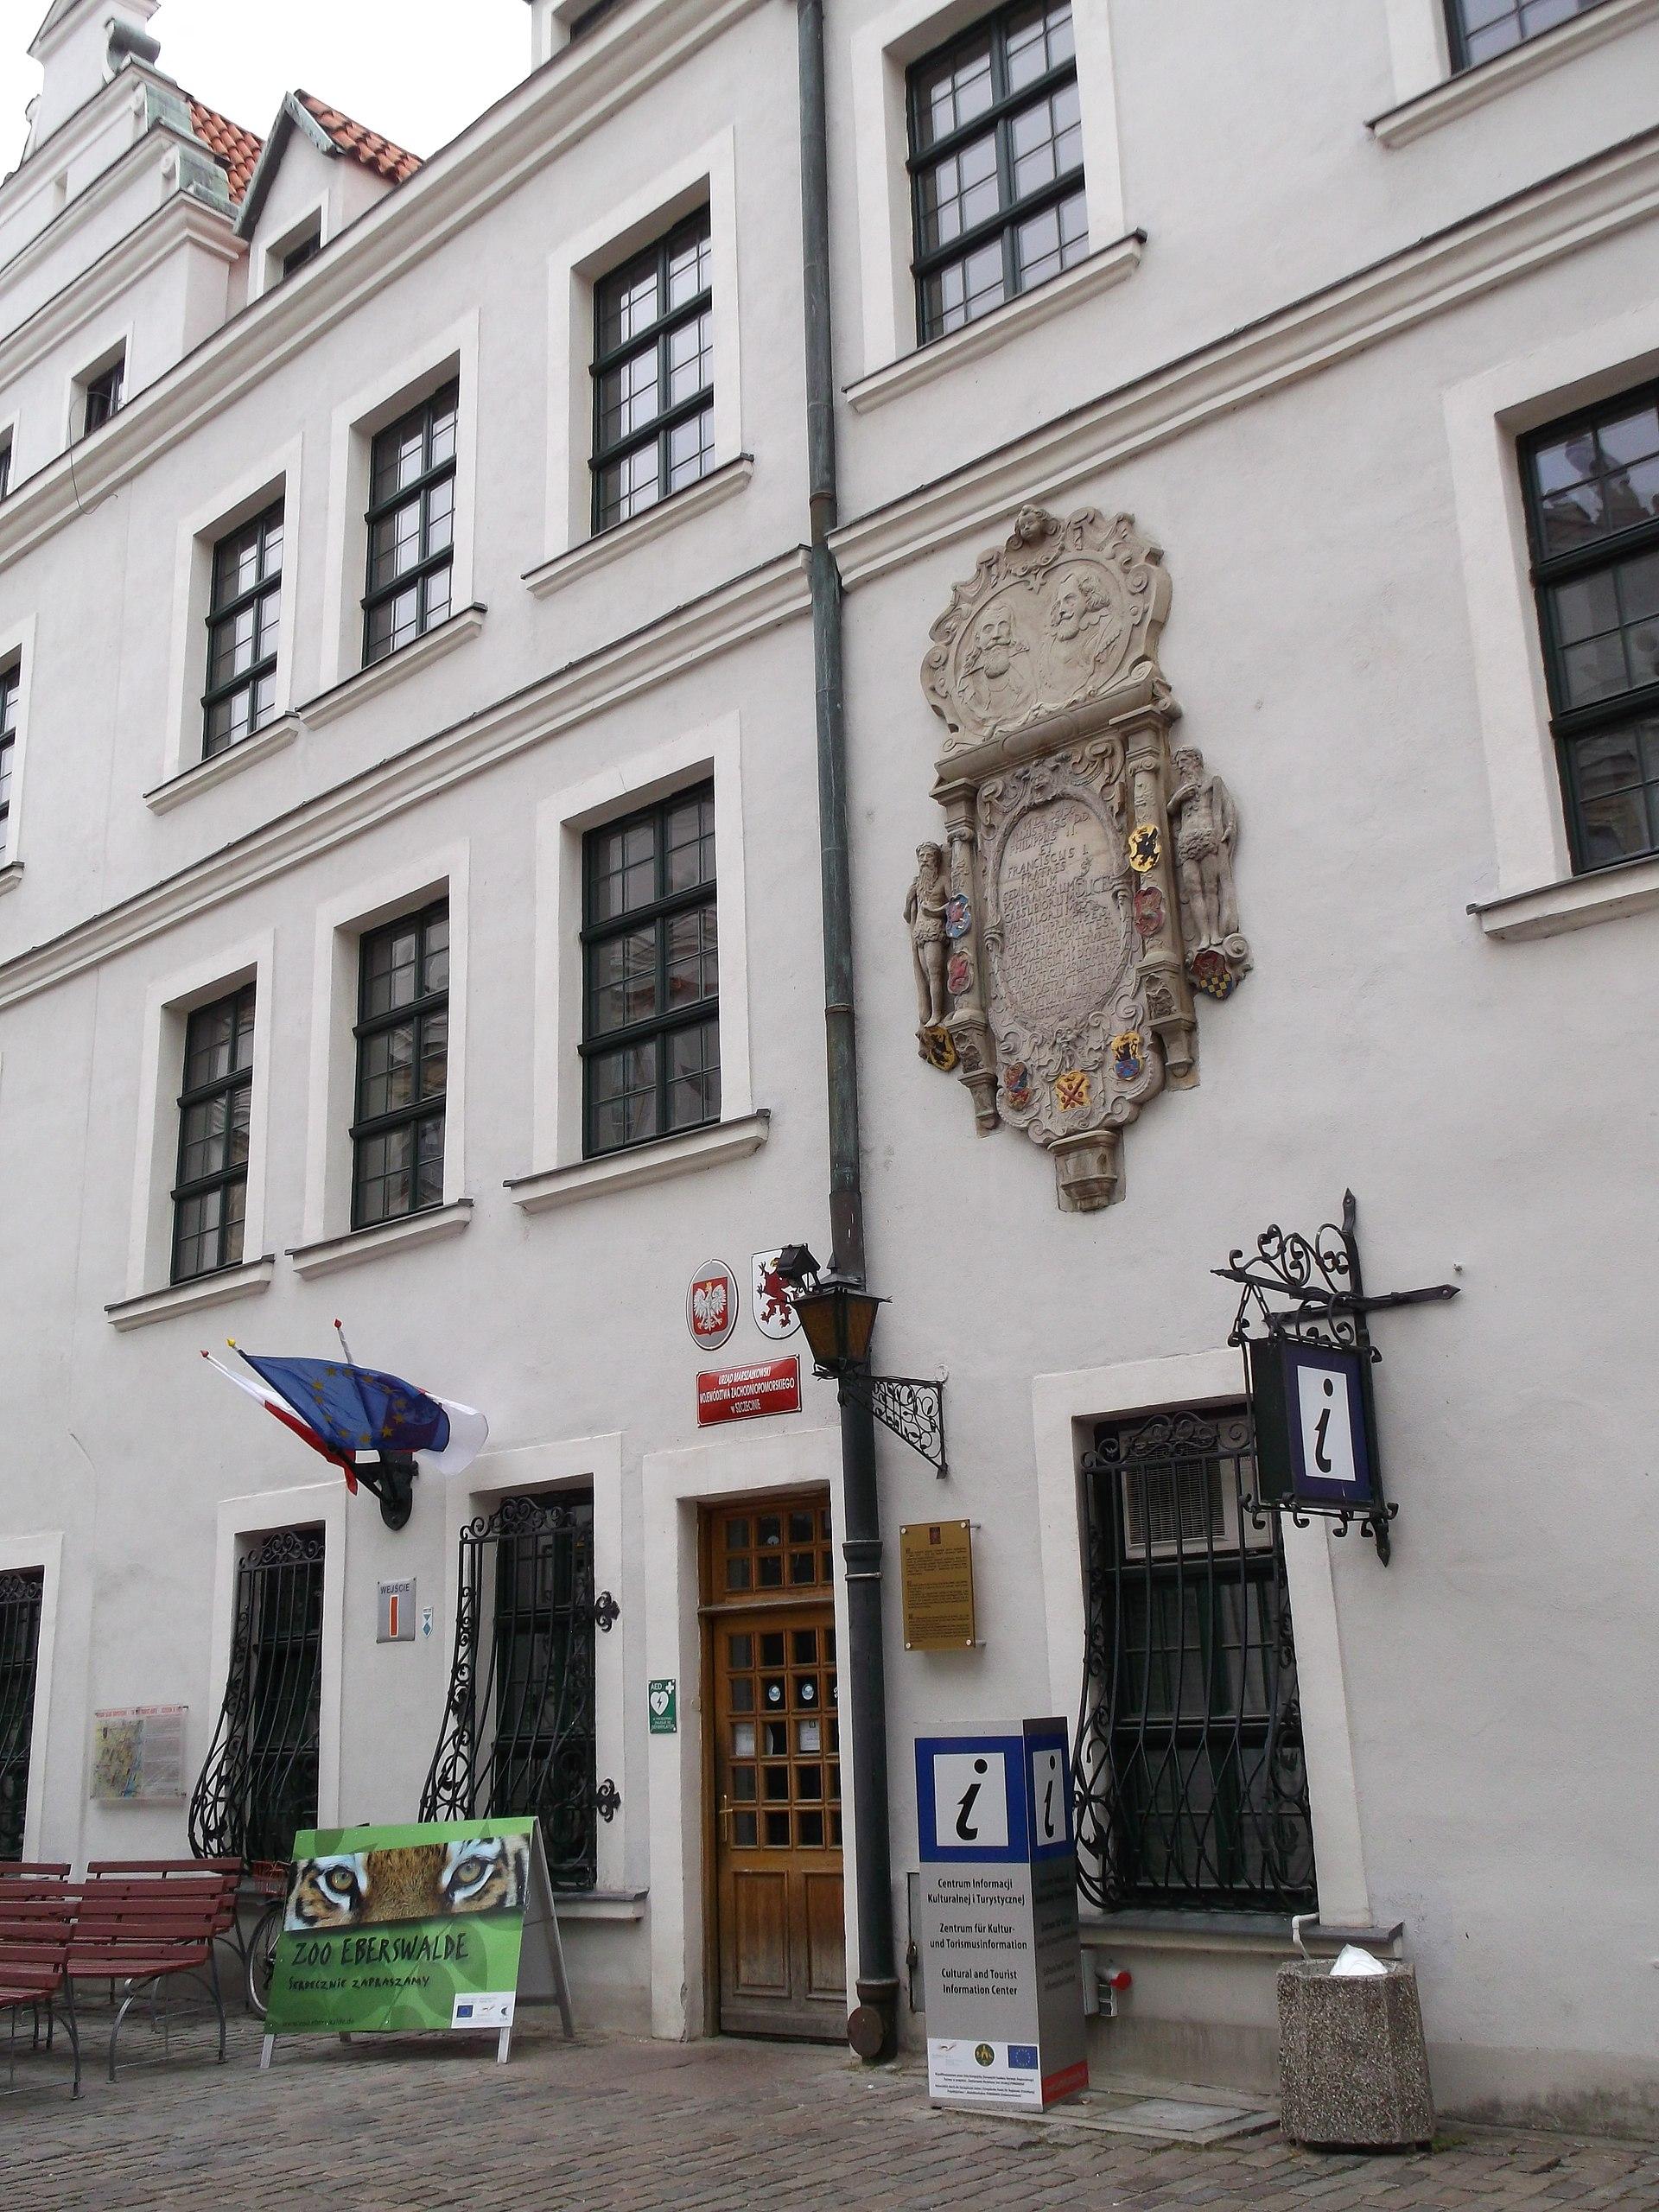 Oficina de turismo wikipedia la enciclopedia libre for Oficina turismo francia en madrid